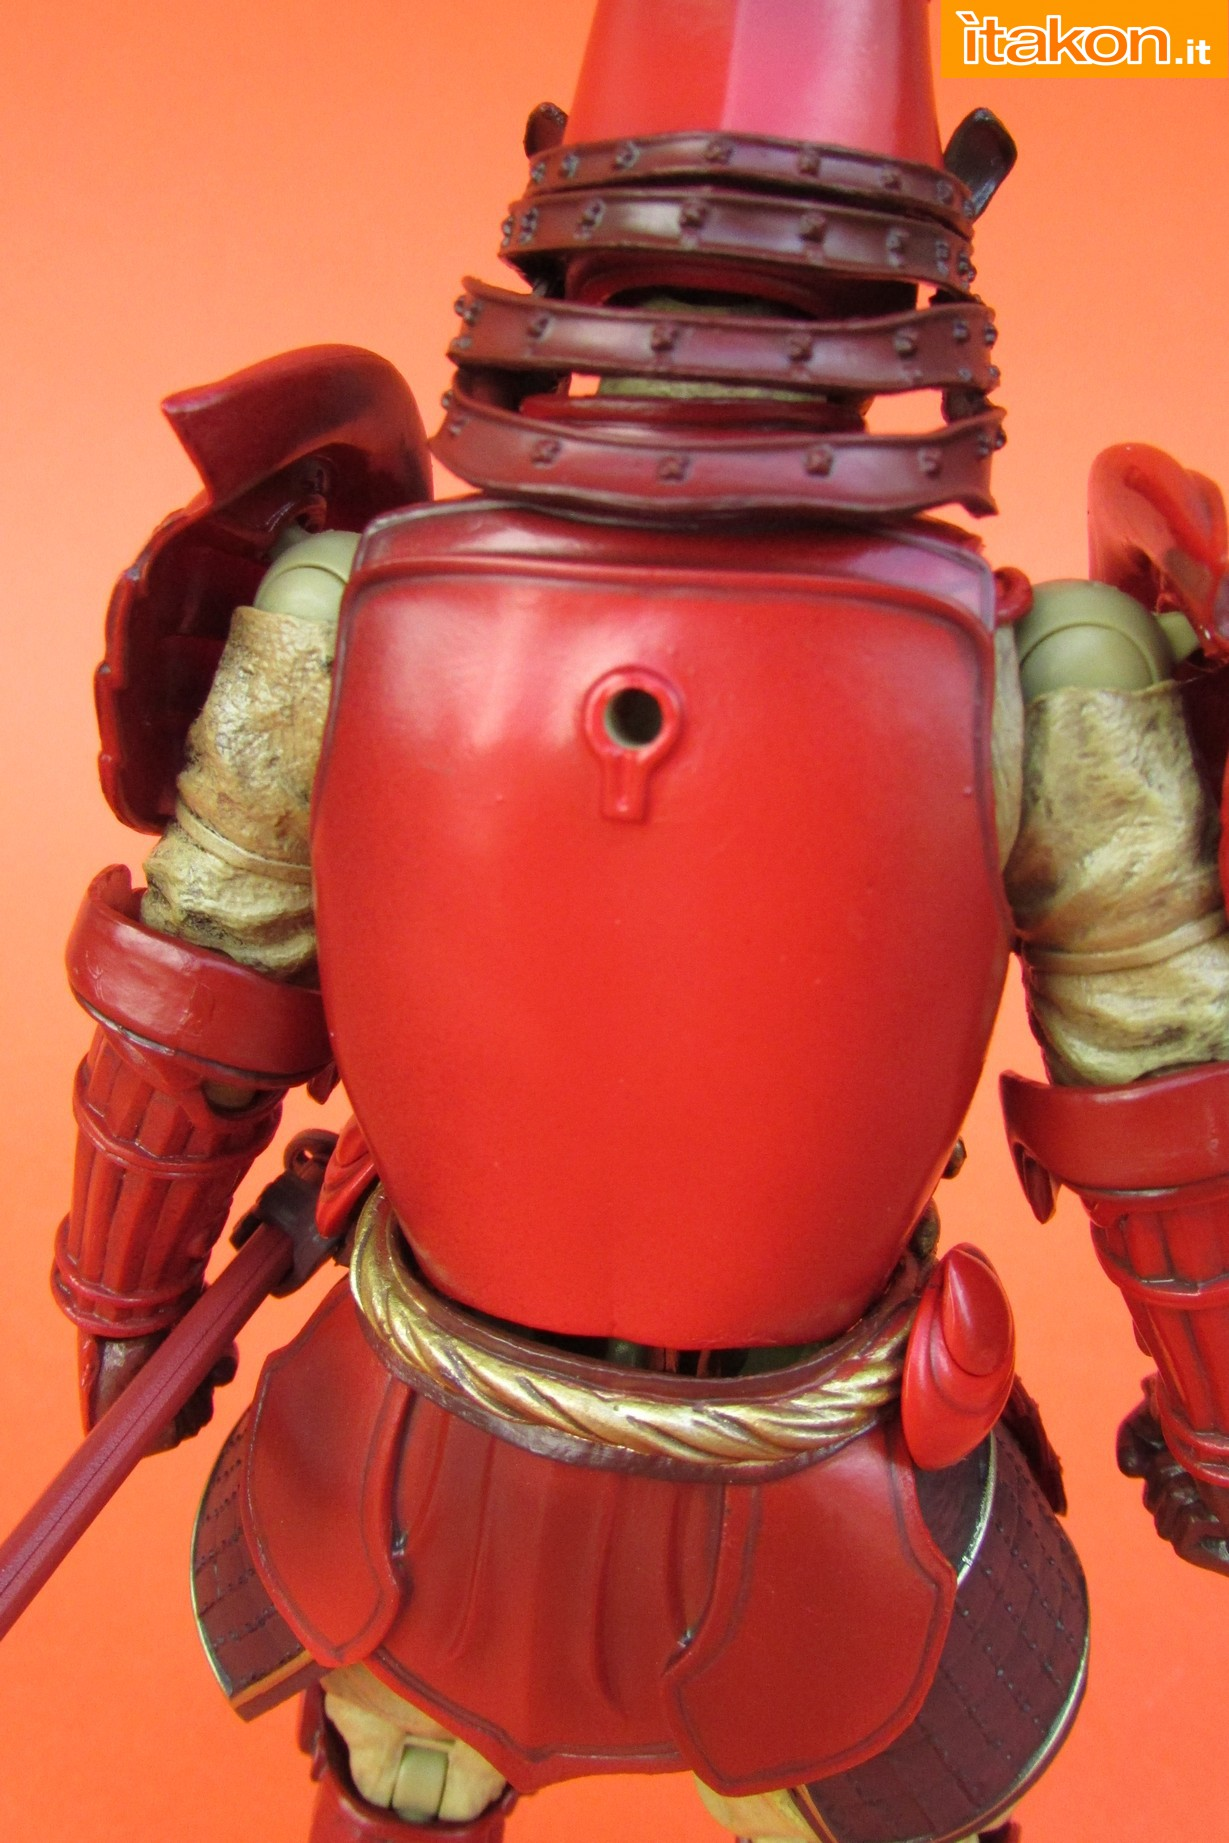 Link a Marvel Comics Koutetsu Samurai Iron Man Mark 3 Meishou MANGA REALIZATION review Bandai Itakon.it22